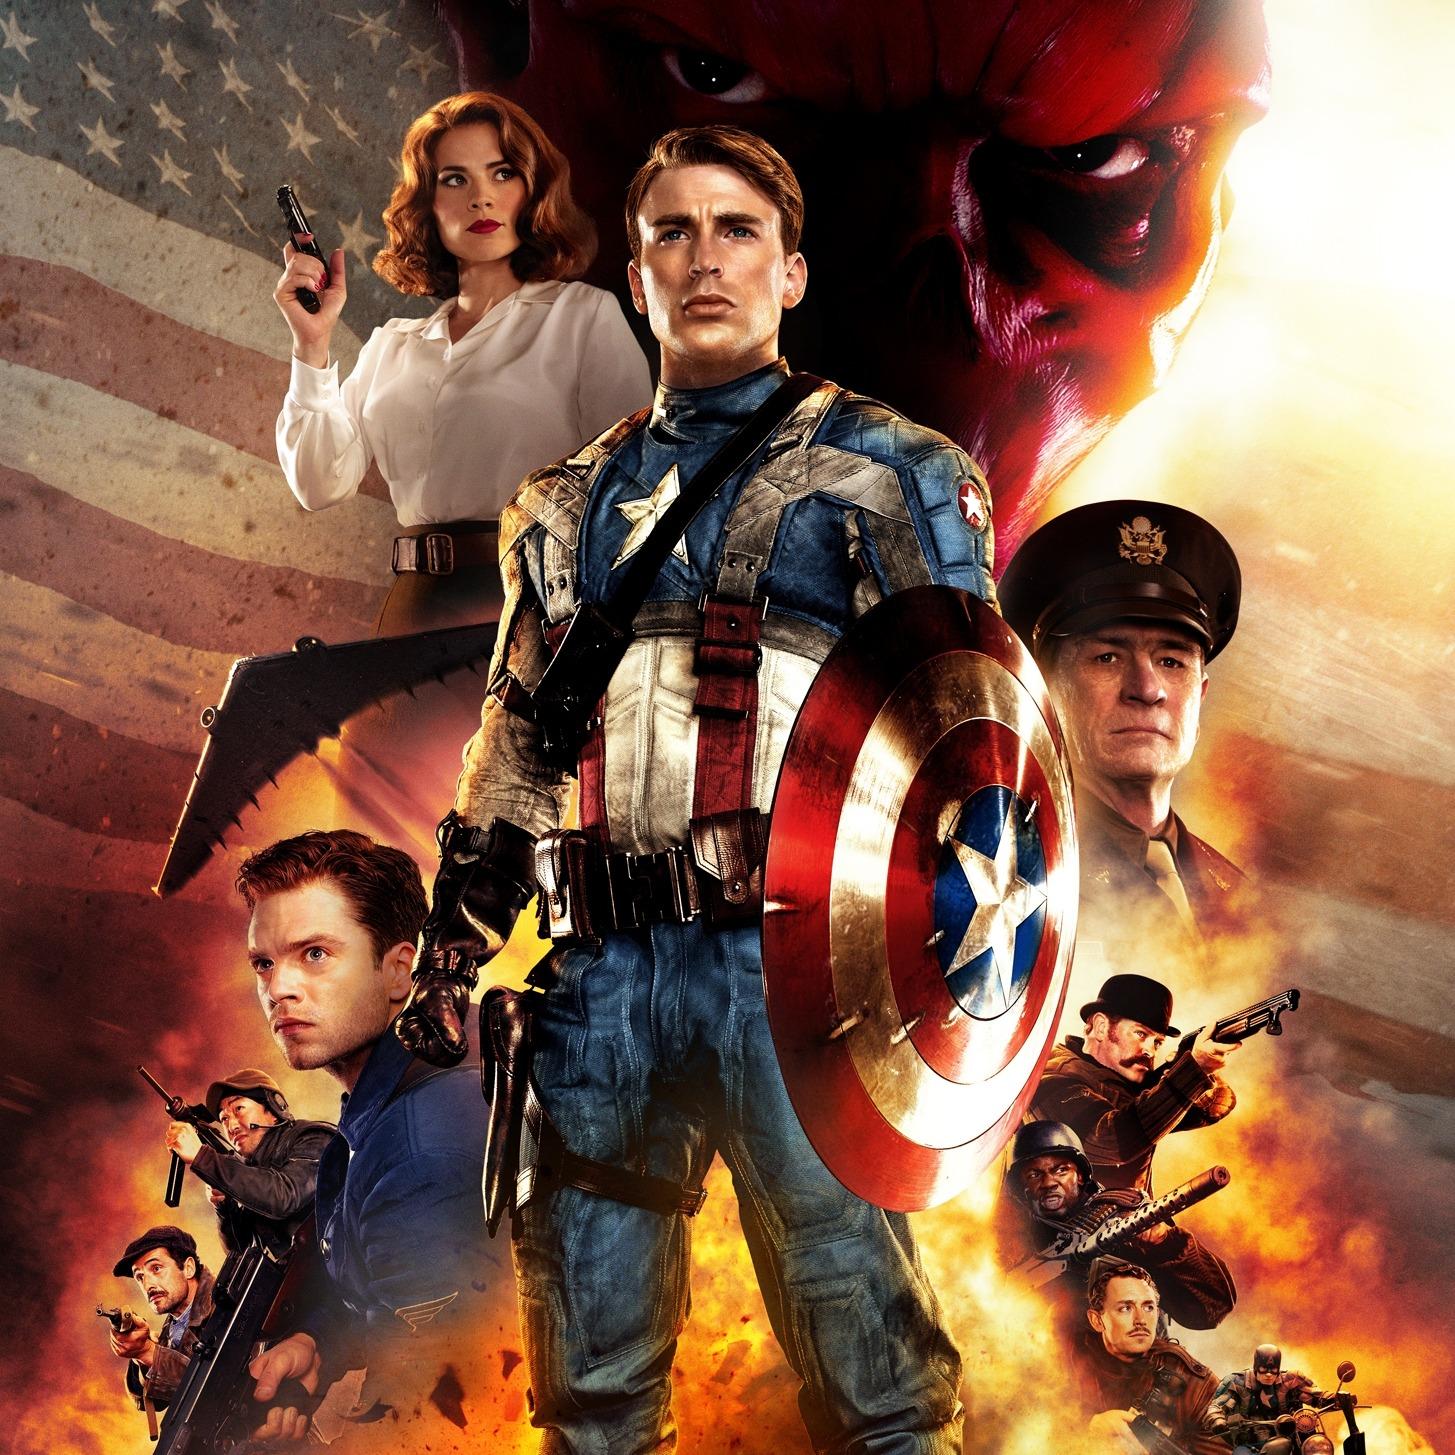 PODCAST CINEMA | critique du film CAPTAIN AMERICA FIRST AVENGER (2011) | CinéMaRadio